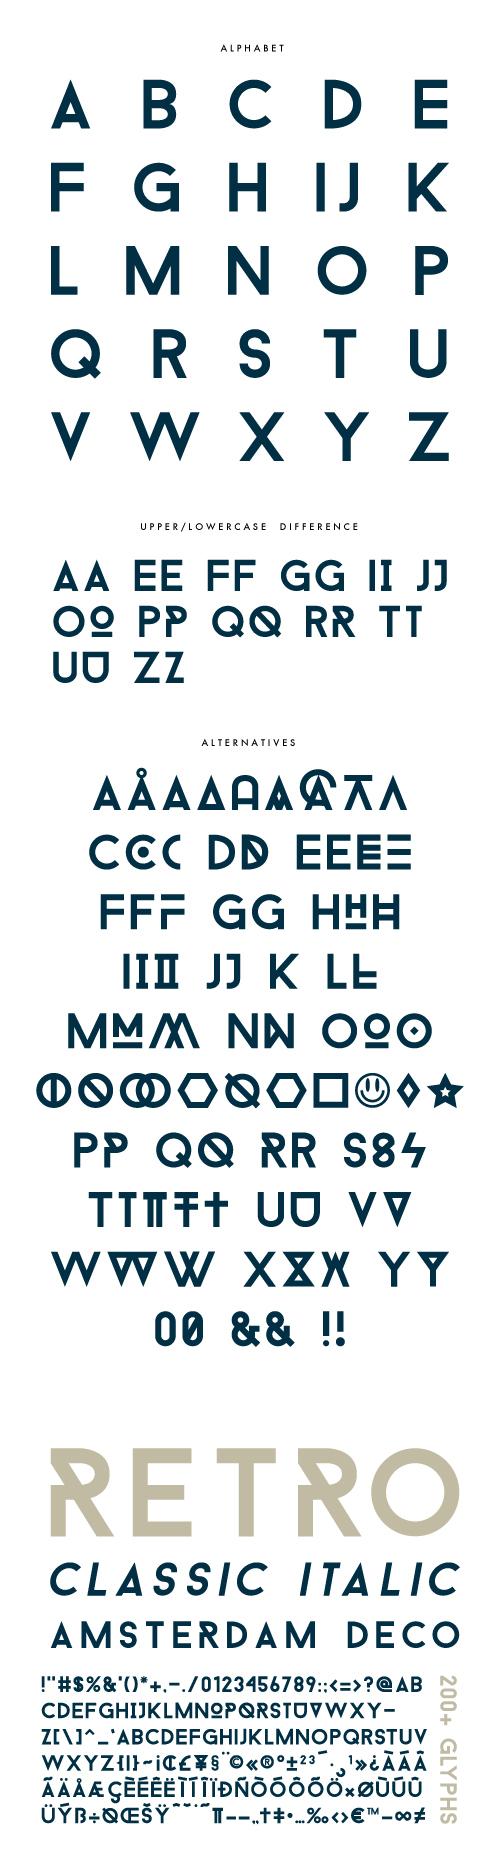 Free Font Friday